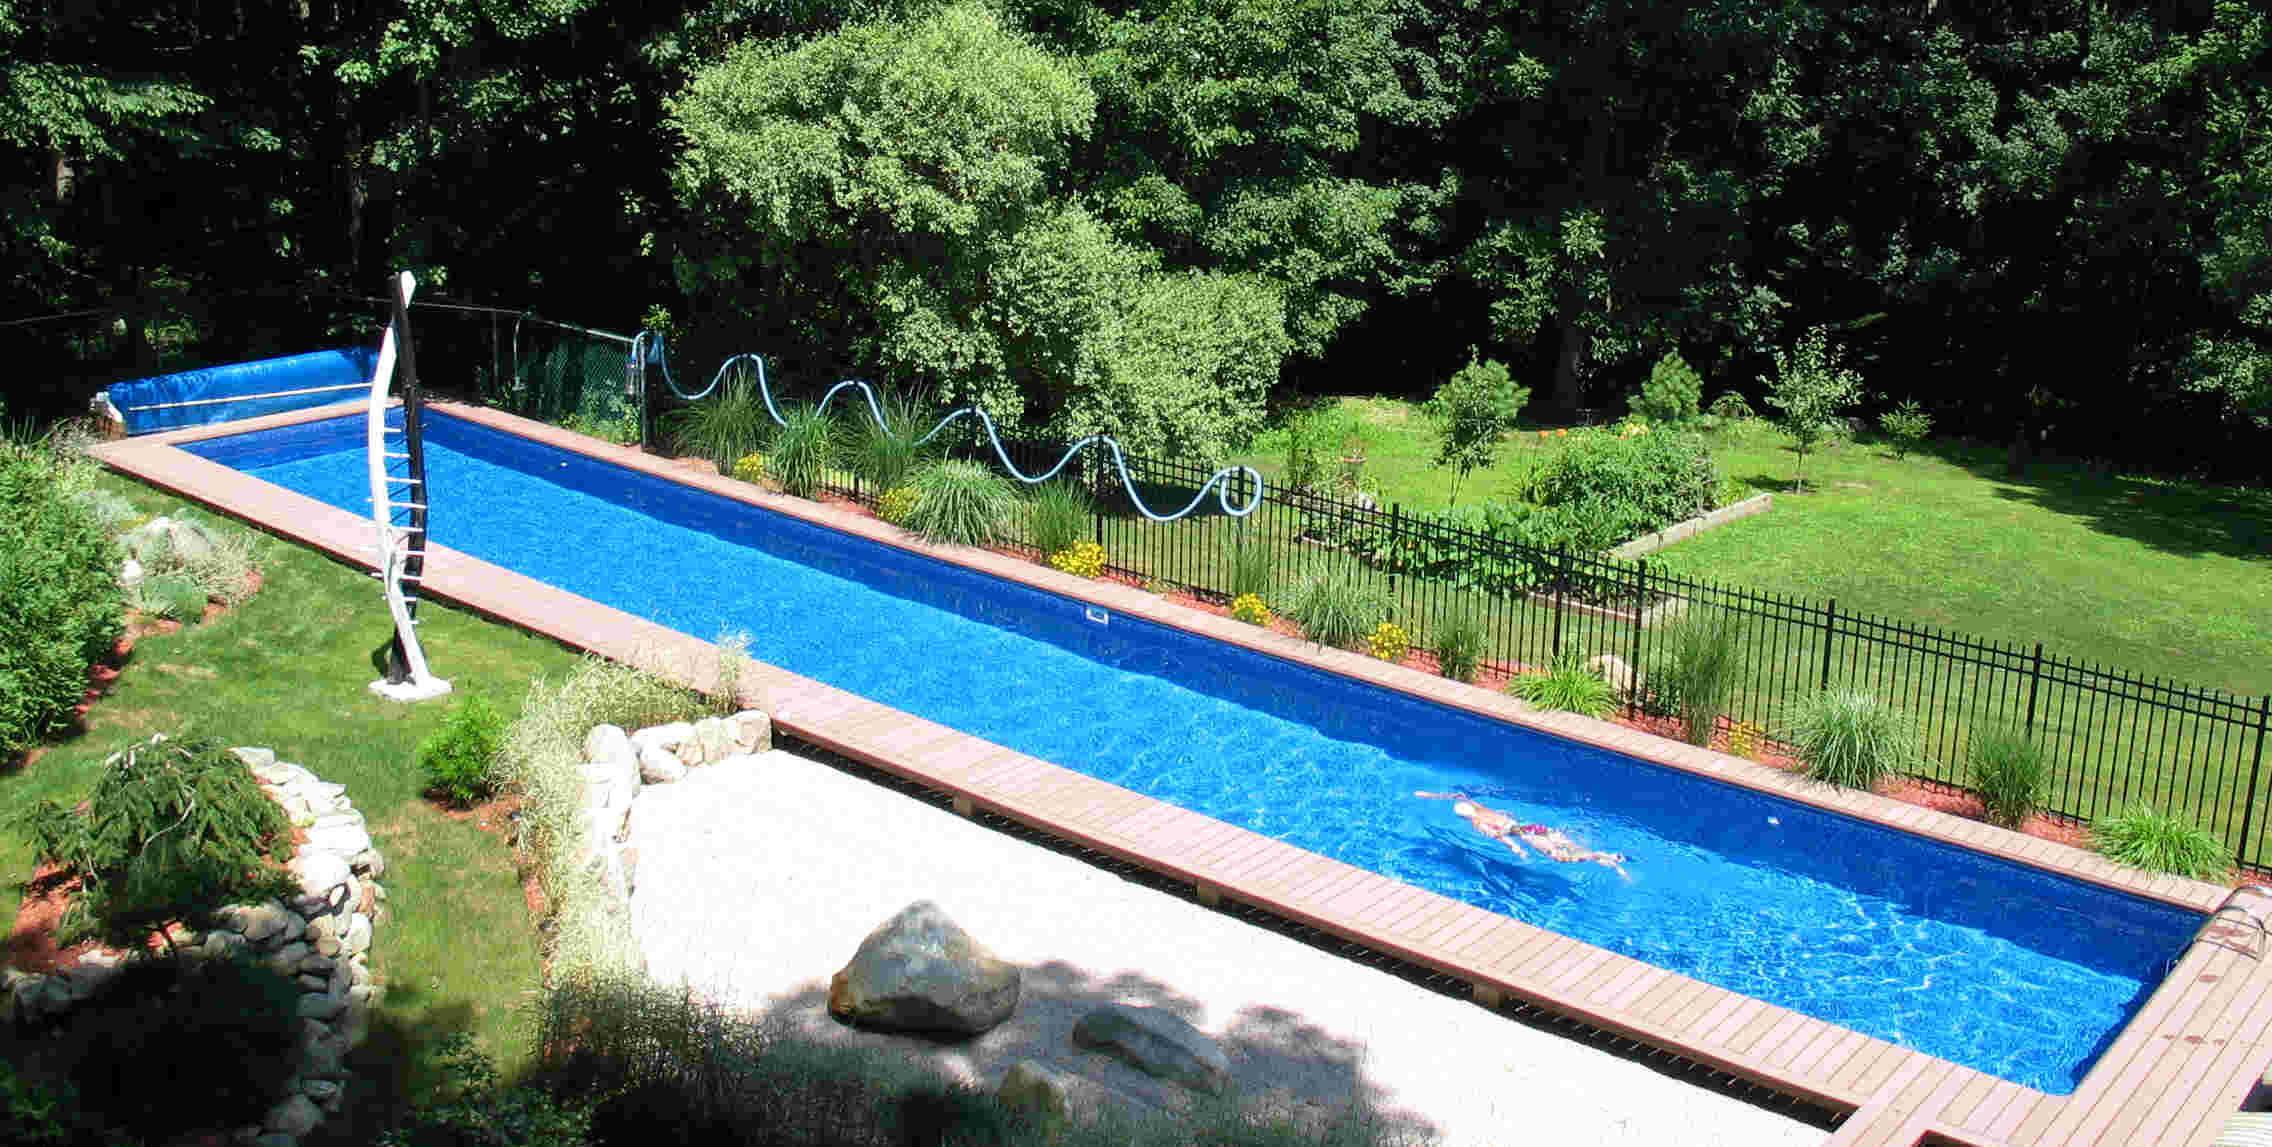 Best ideas about DIY Endless Pool . Save or Pin DIY Inground Swimming Pools Now.